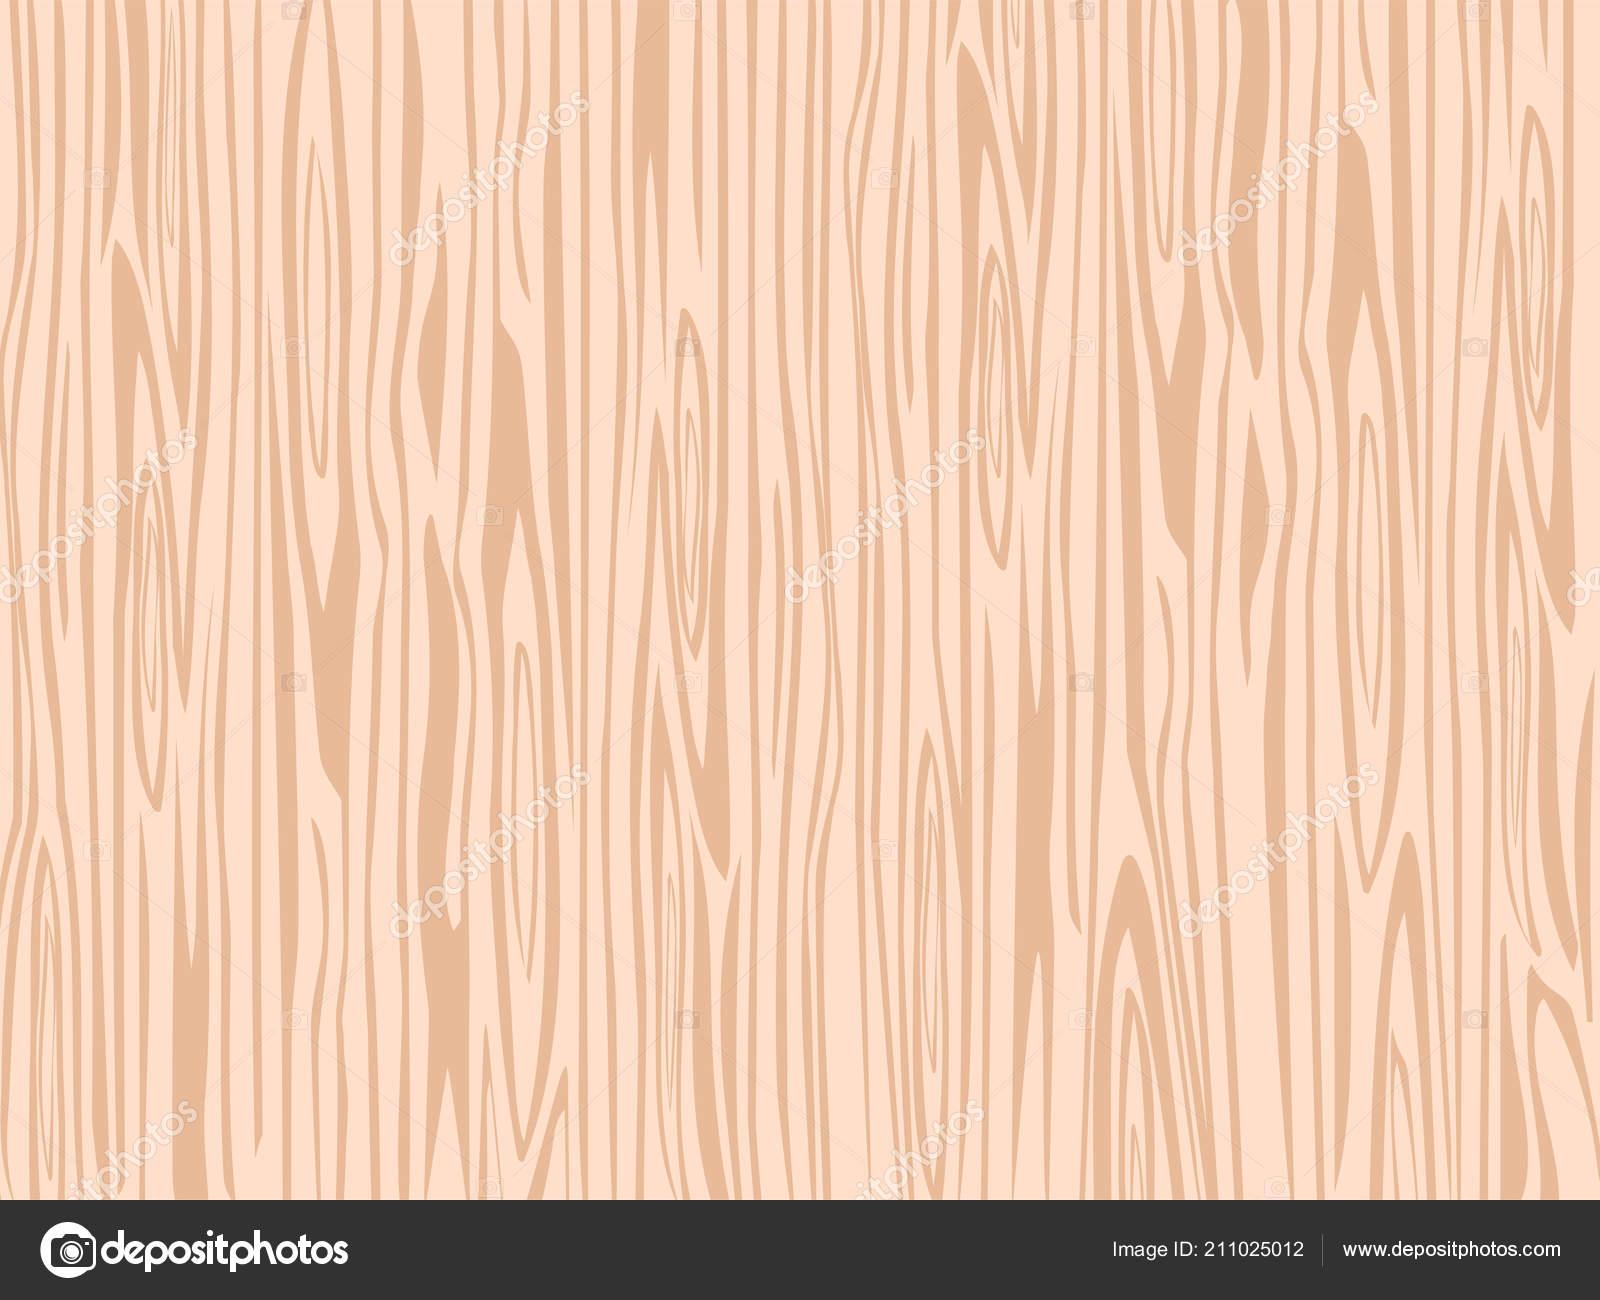 Light Parquet Seamless Wooden Floor Stripe Mosaic Tile Editable Vector Stock